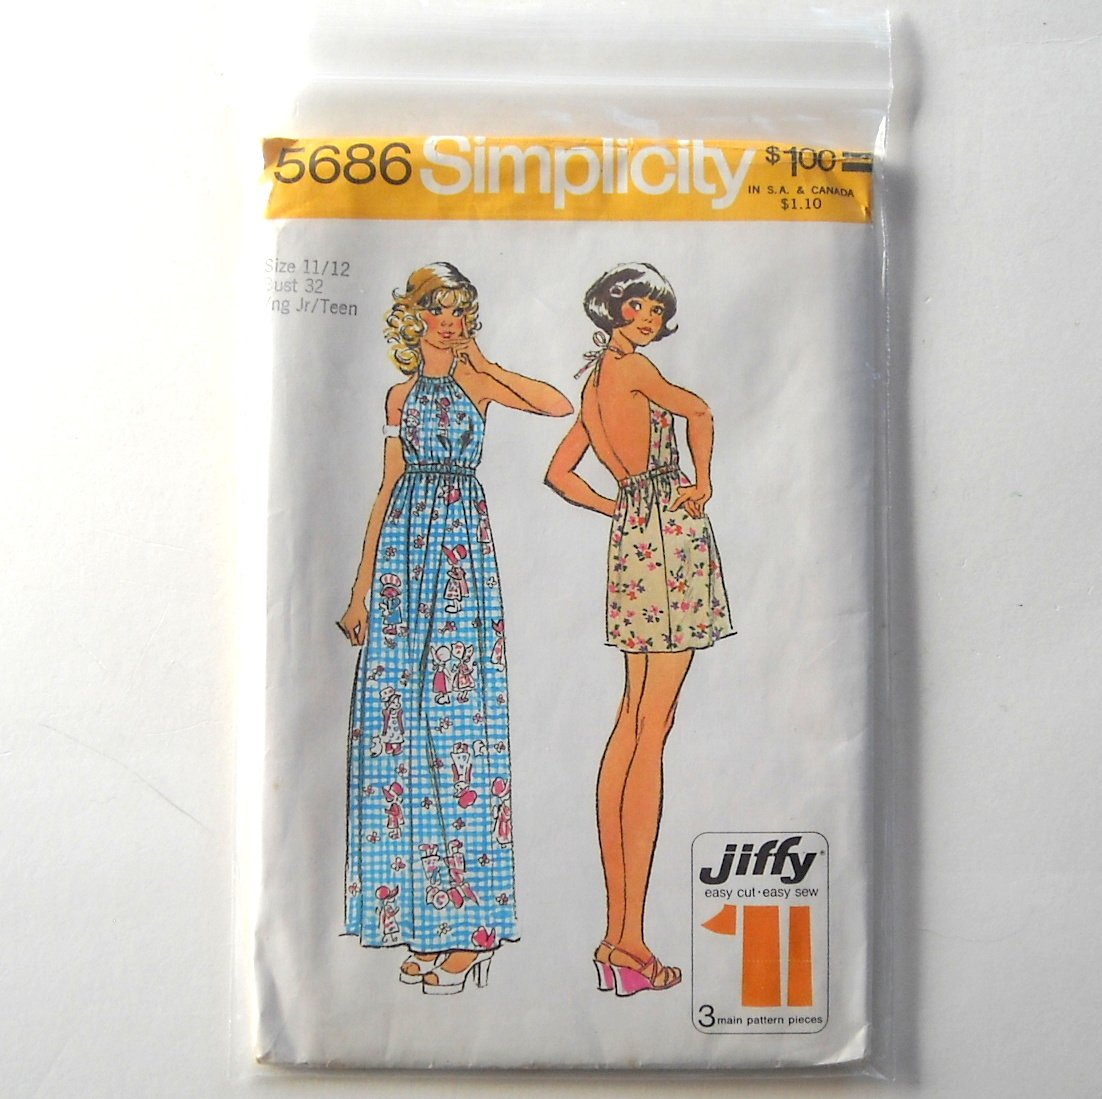 Junior Teens Jiffy Halter Dress Size 11 - 12 Vintage Simplicity Sewing Pattern 5686